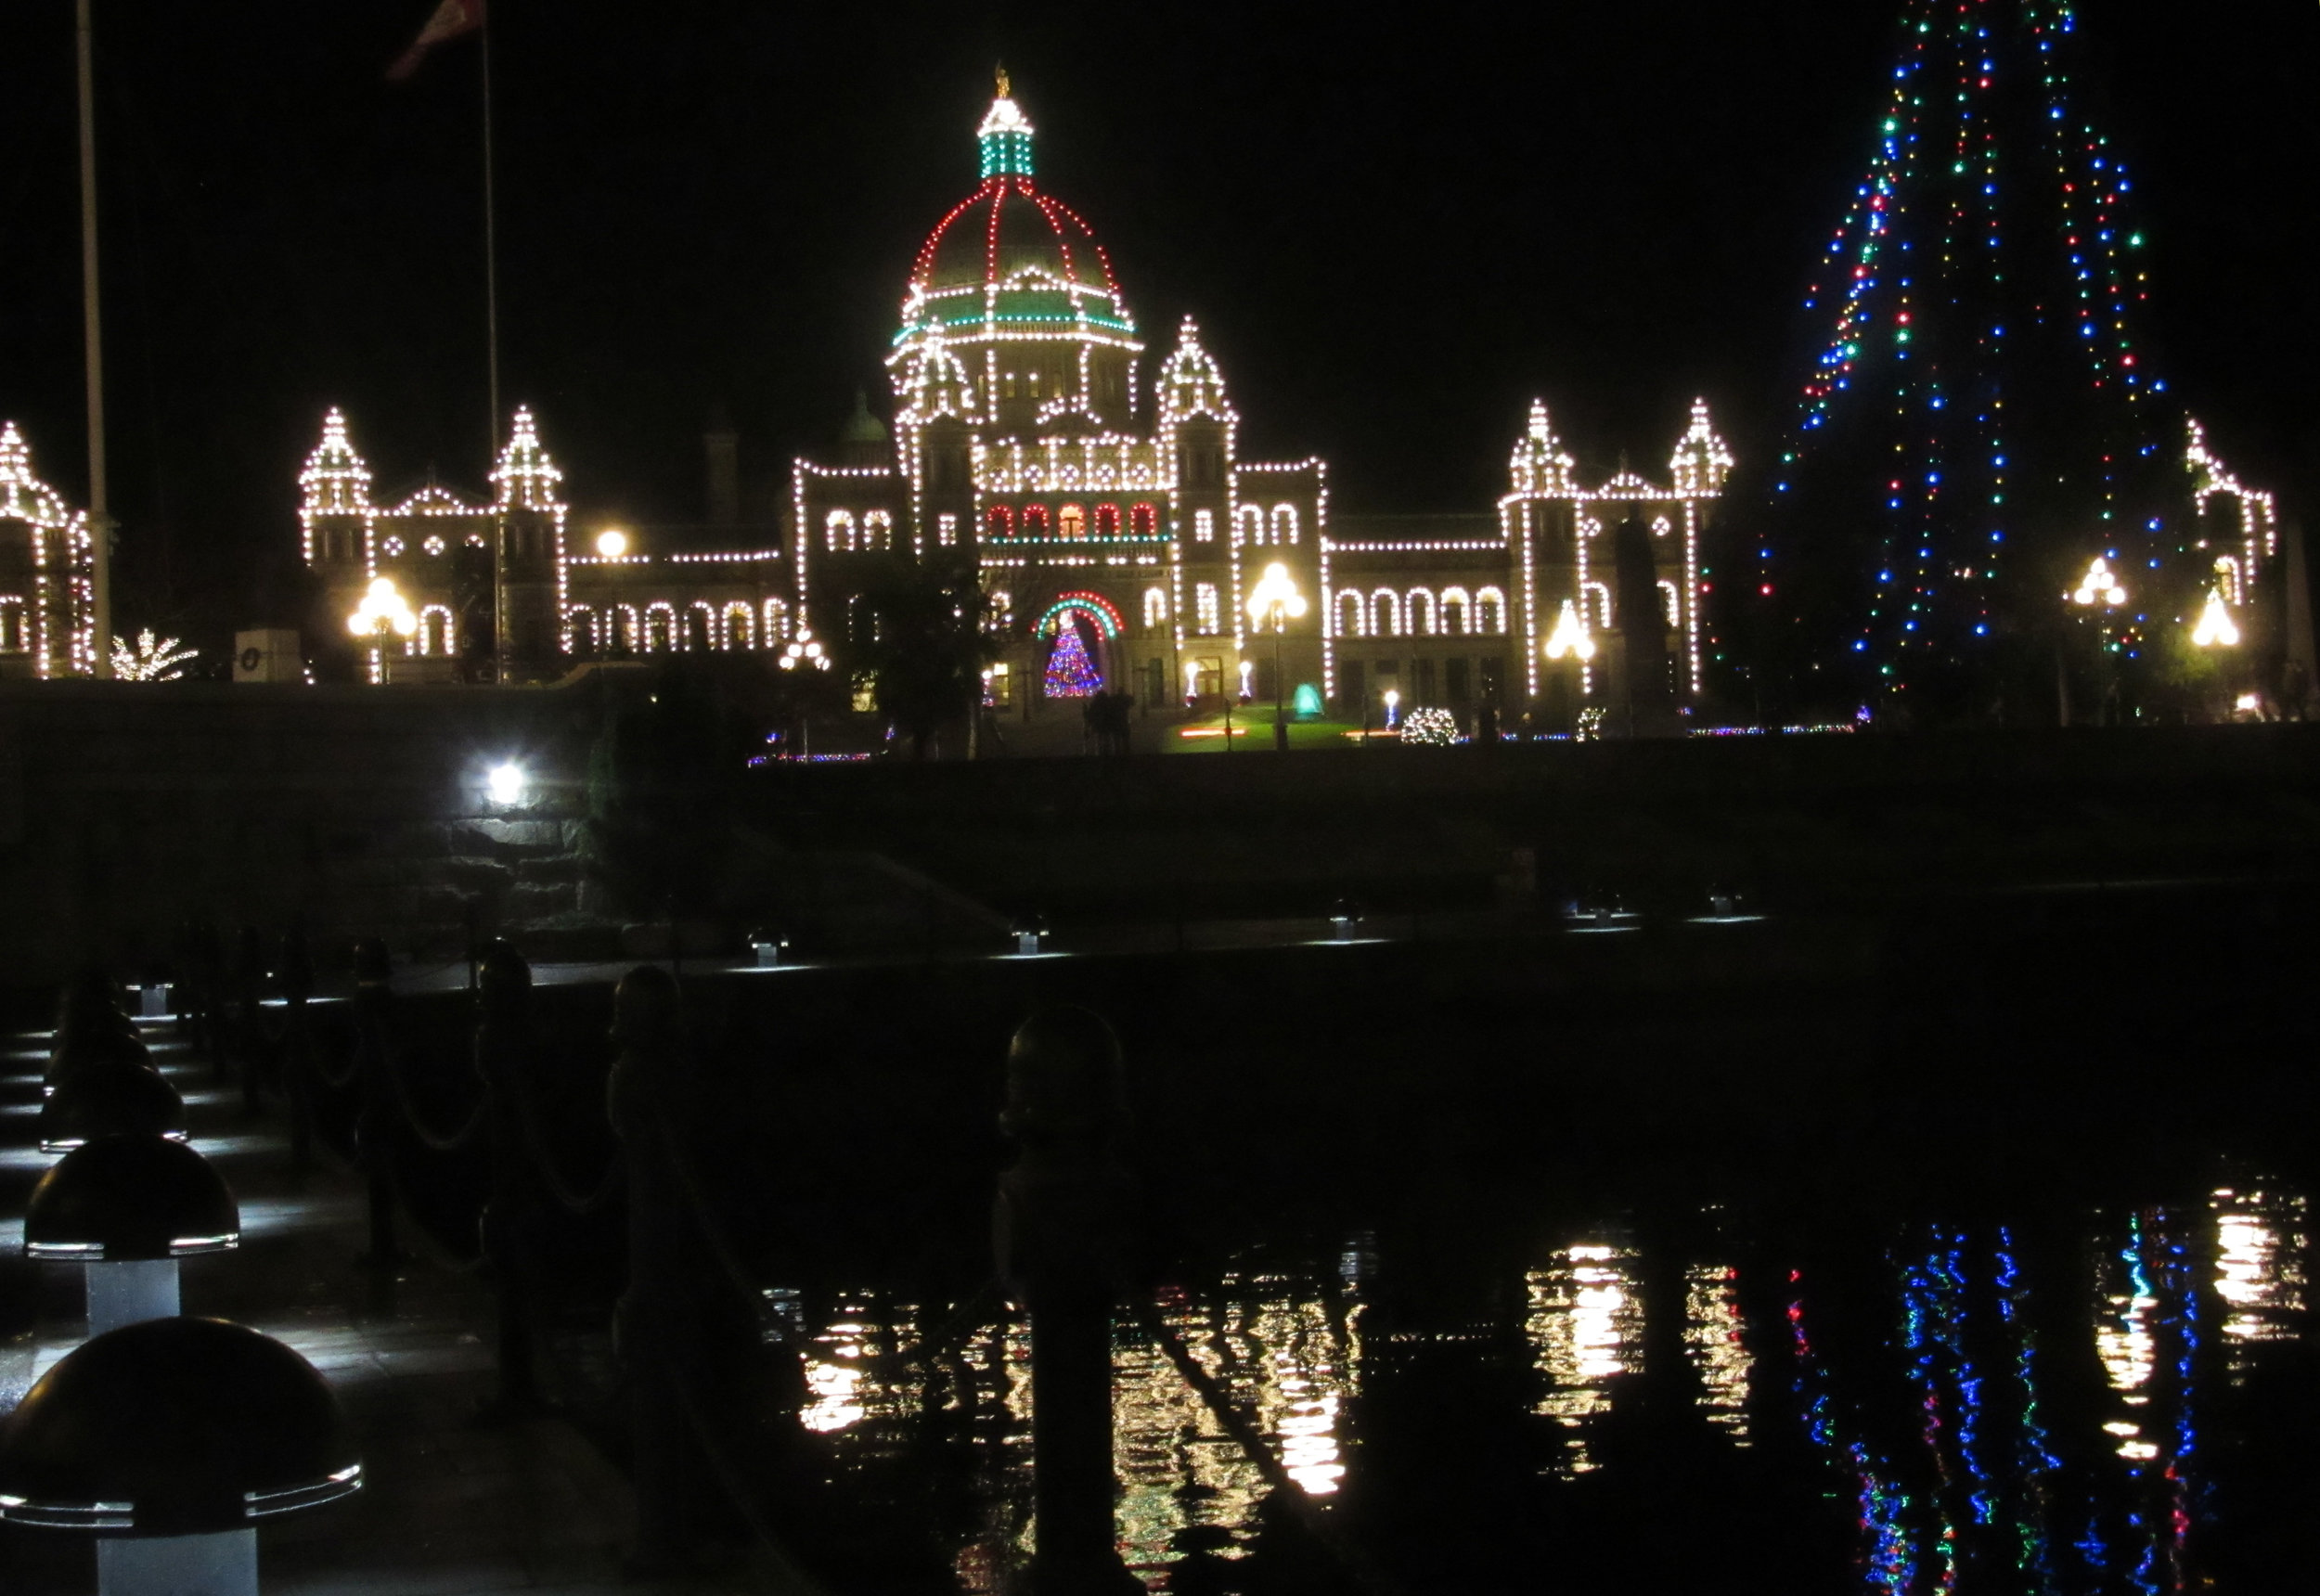 Legislature- trudy chiswell.jpg